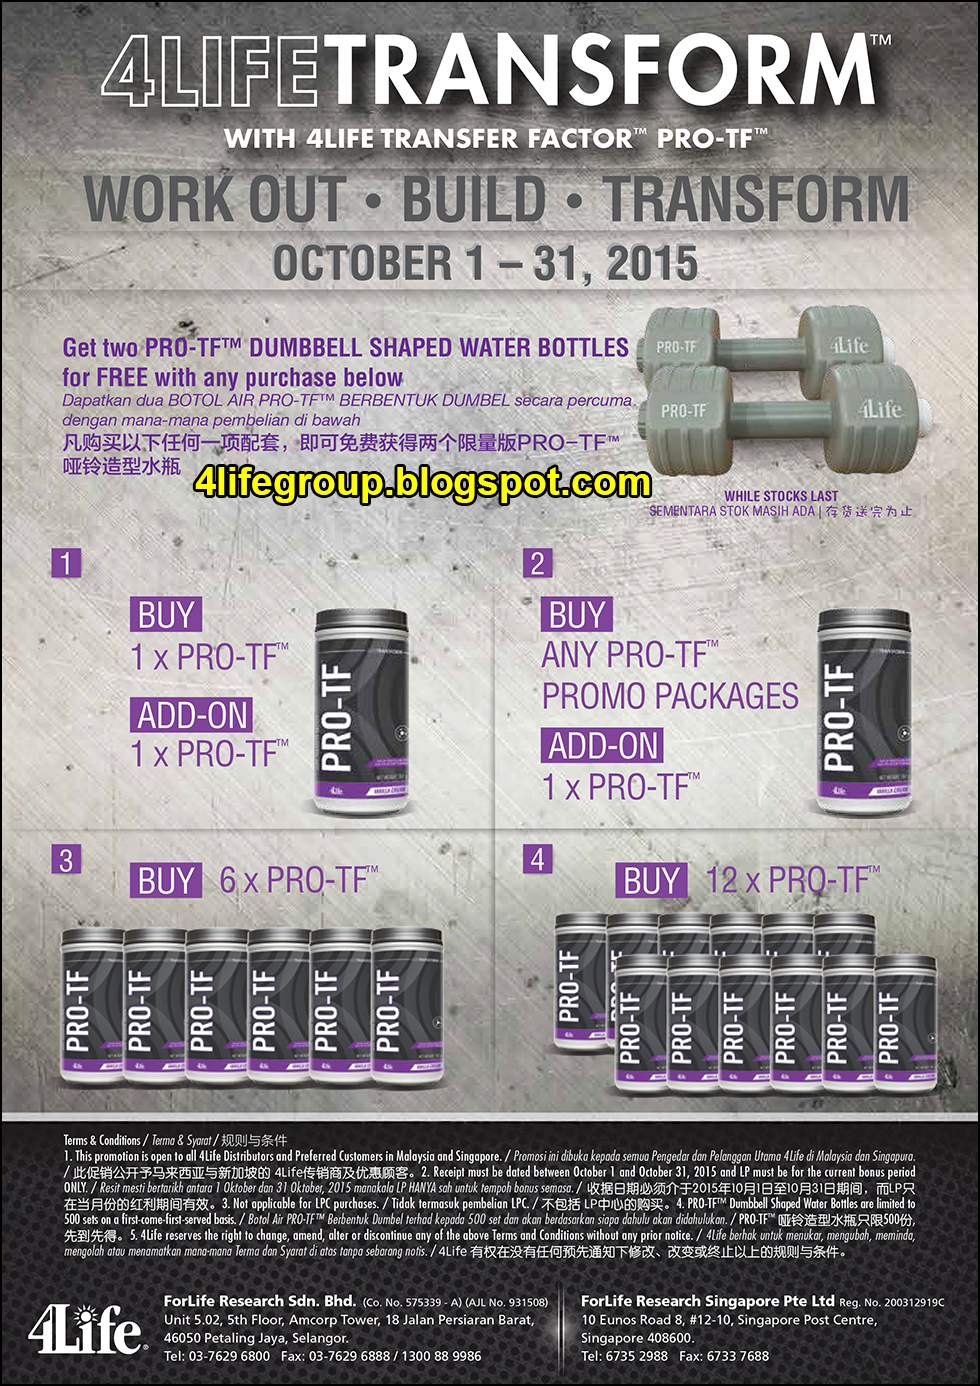 foto 4Life Transfer Factor™ PRO-TF™ Oktober Promo